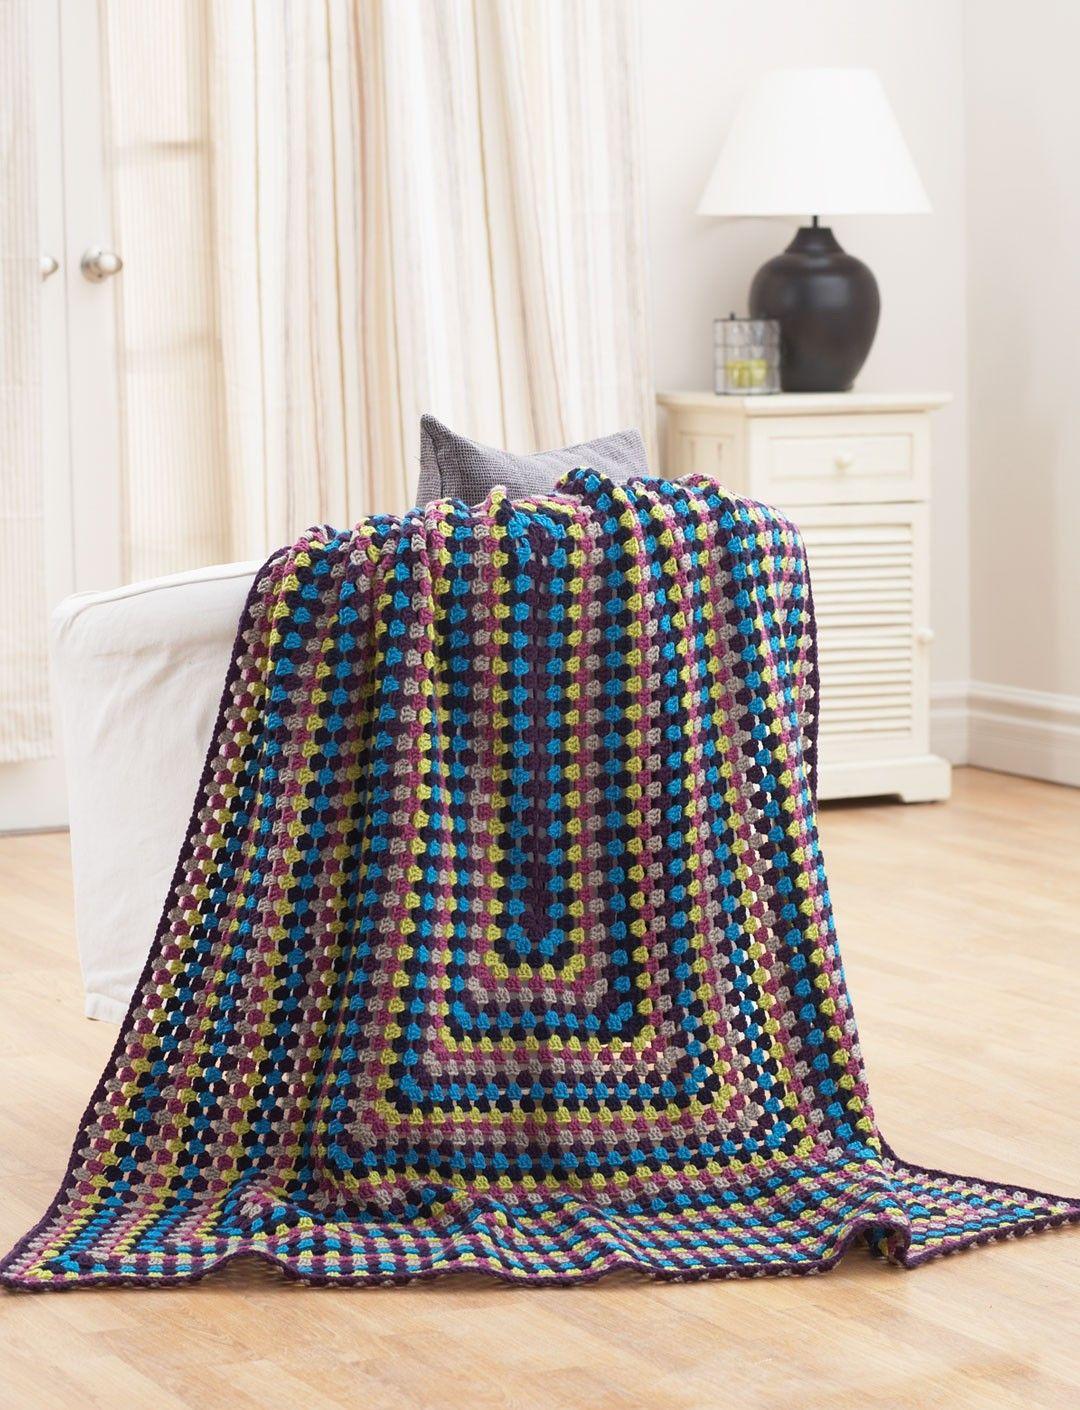 Yarnspirations.com - Bernat Granny Blanket - Patterns ...